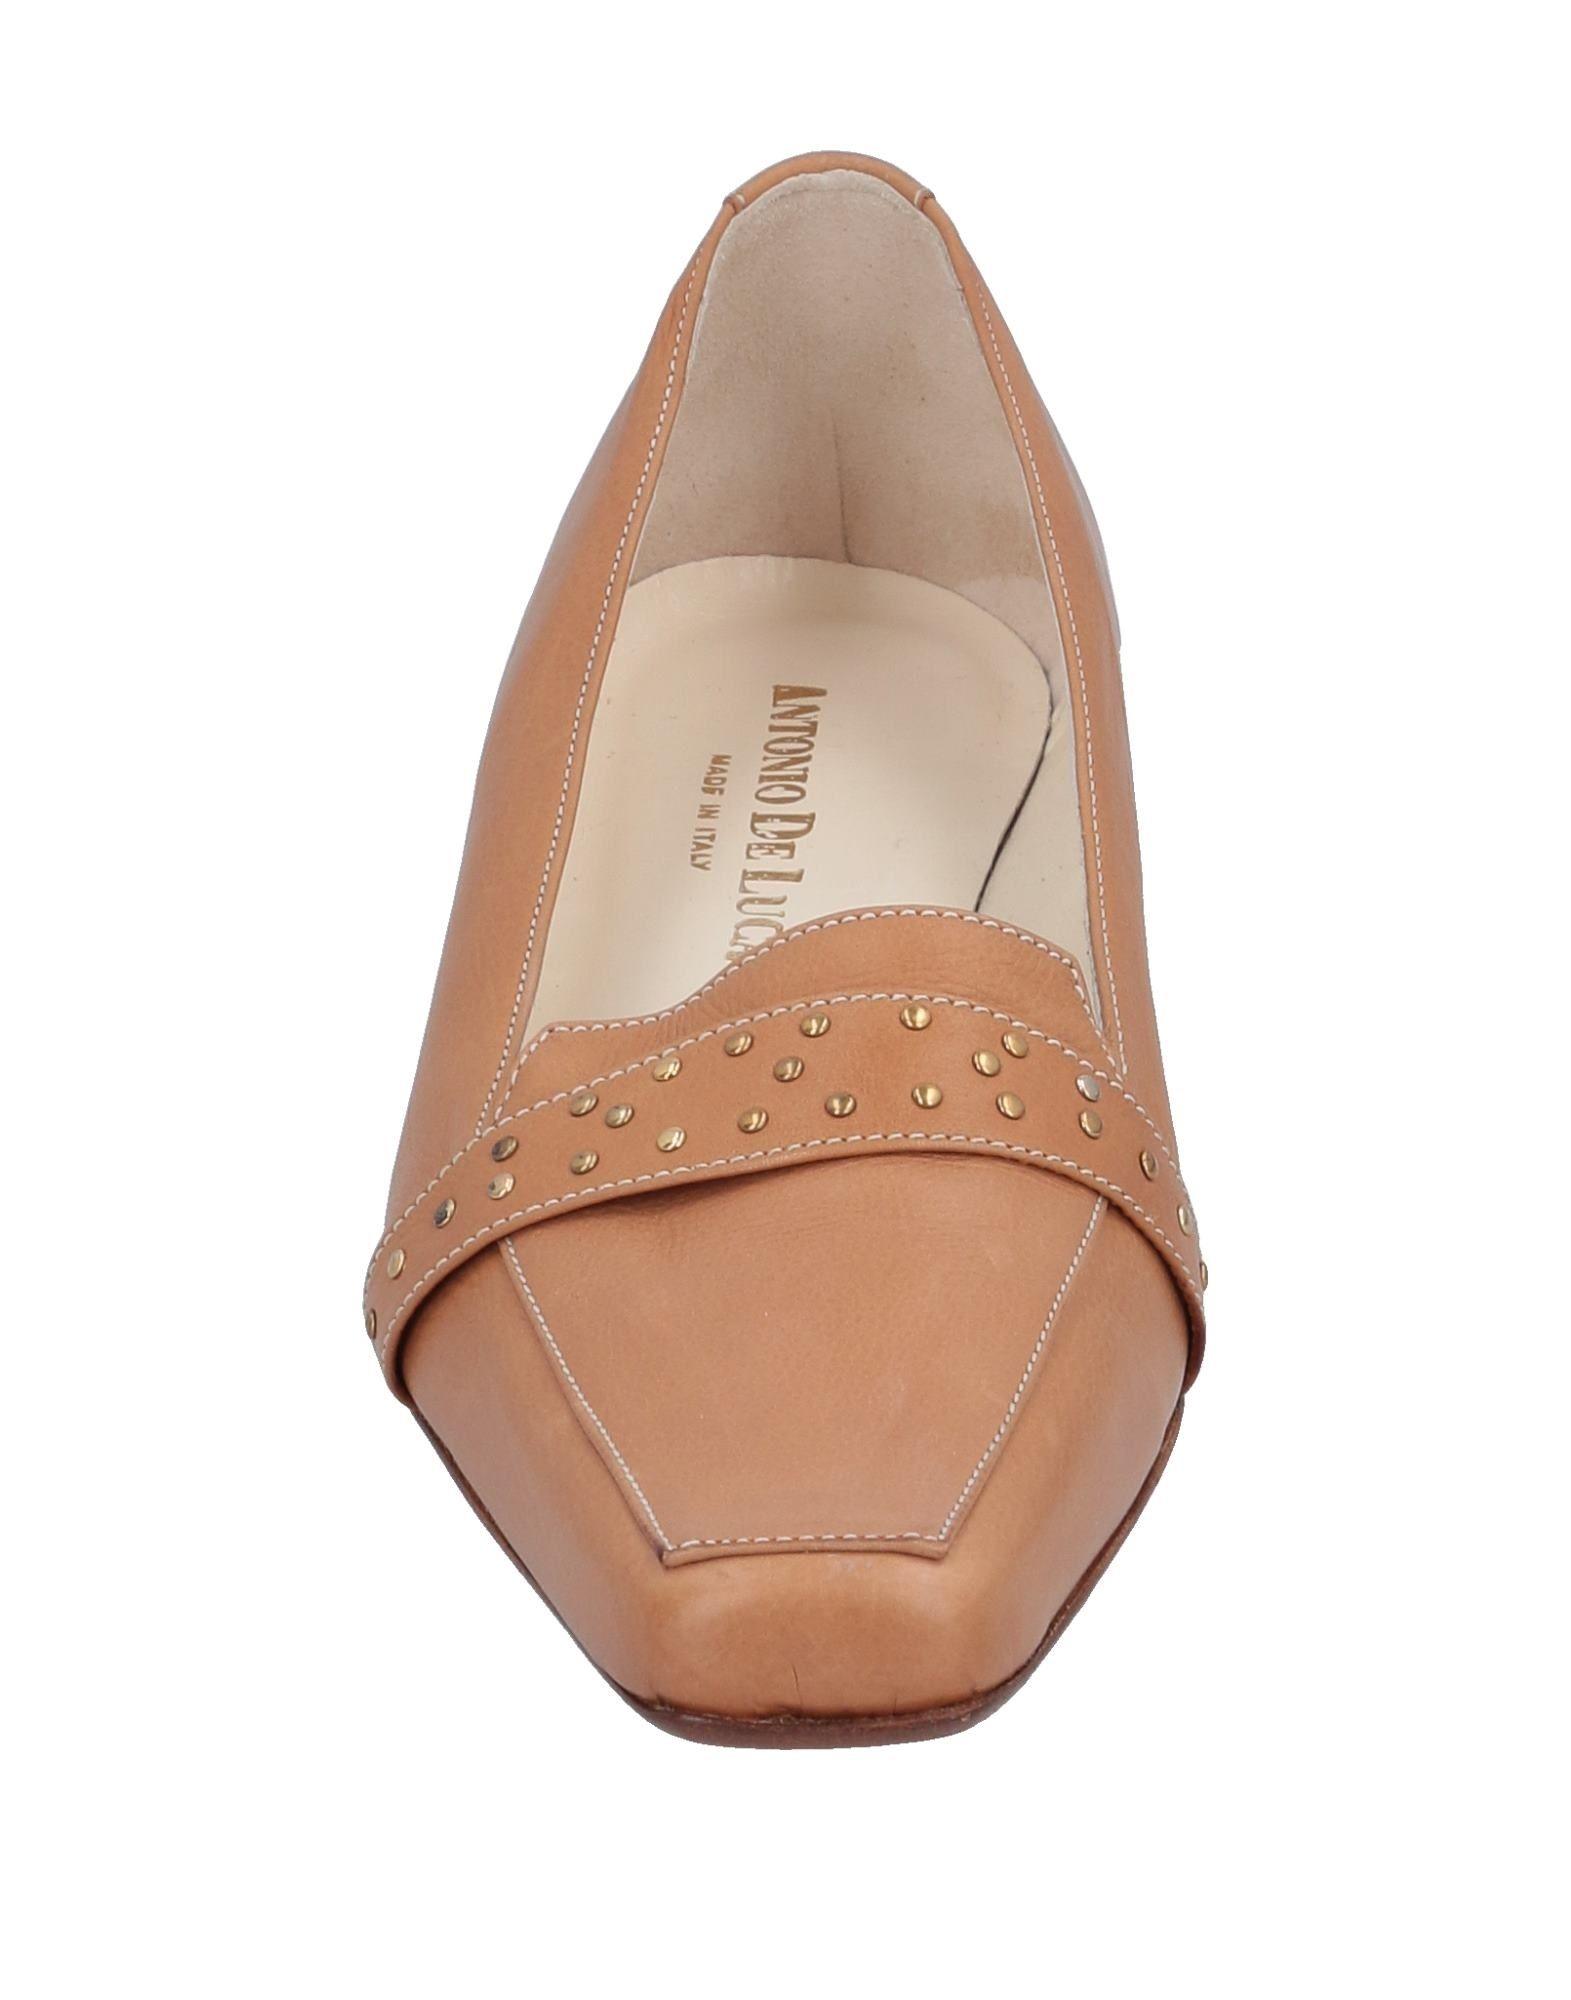 Stilvolle billige Mokassins Schuhe Antonio De Luca Mokassins billige Damen  11519268DS cc2c30